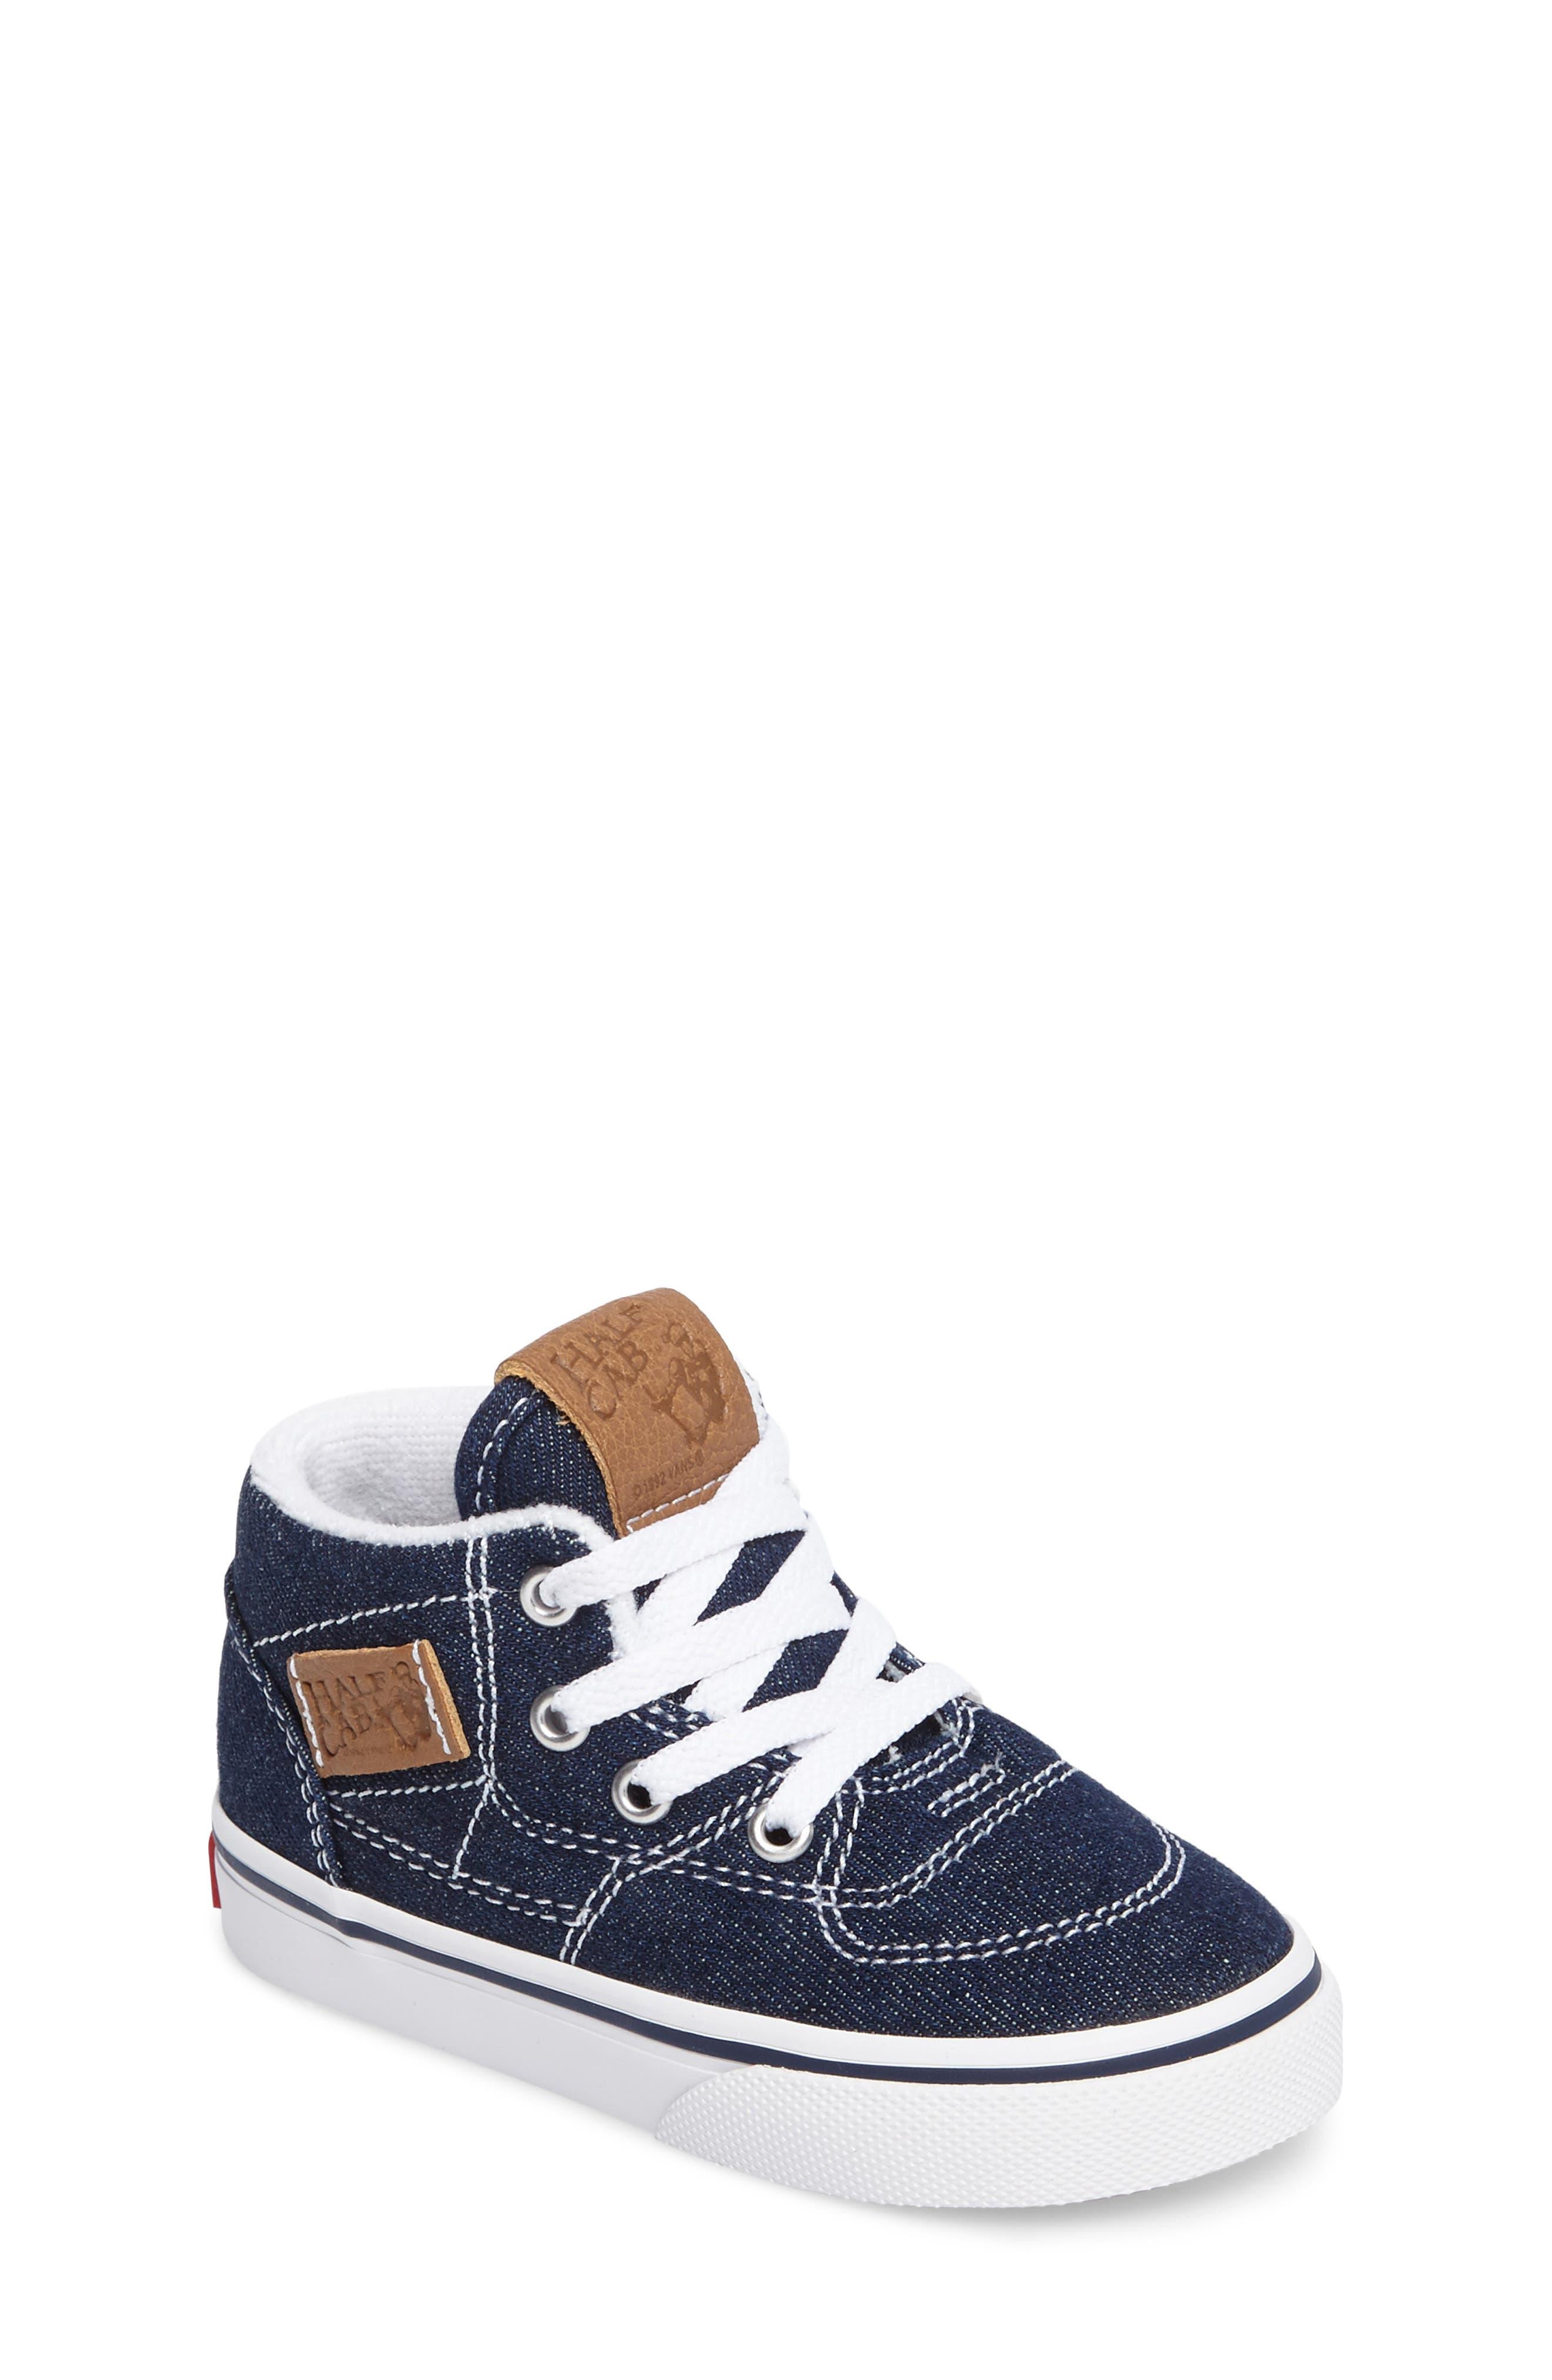 Half Cab Sneaker,                             Main thumbnail 1, color,                             420